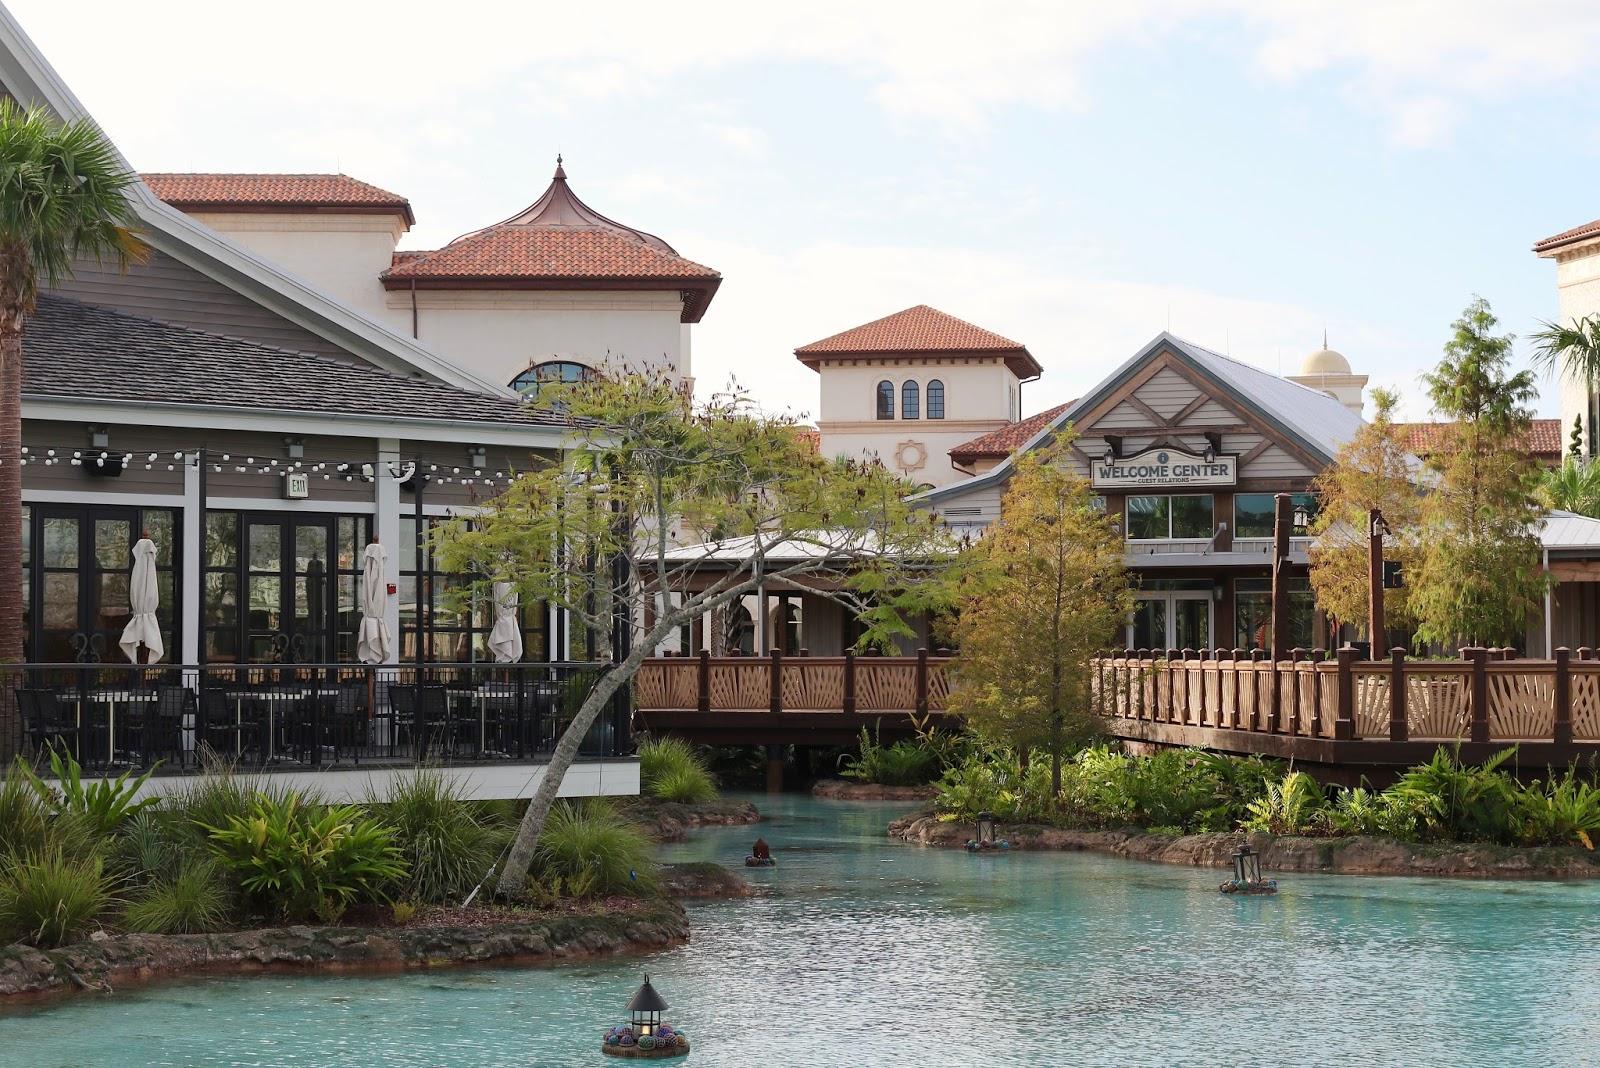 Disney-Springs-Welcome-Centre-Orlando-Florida